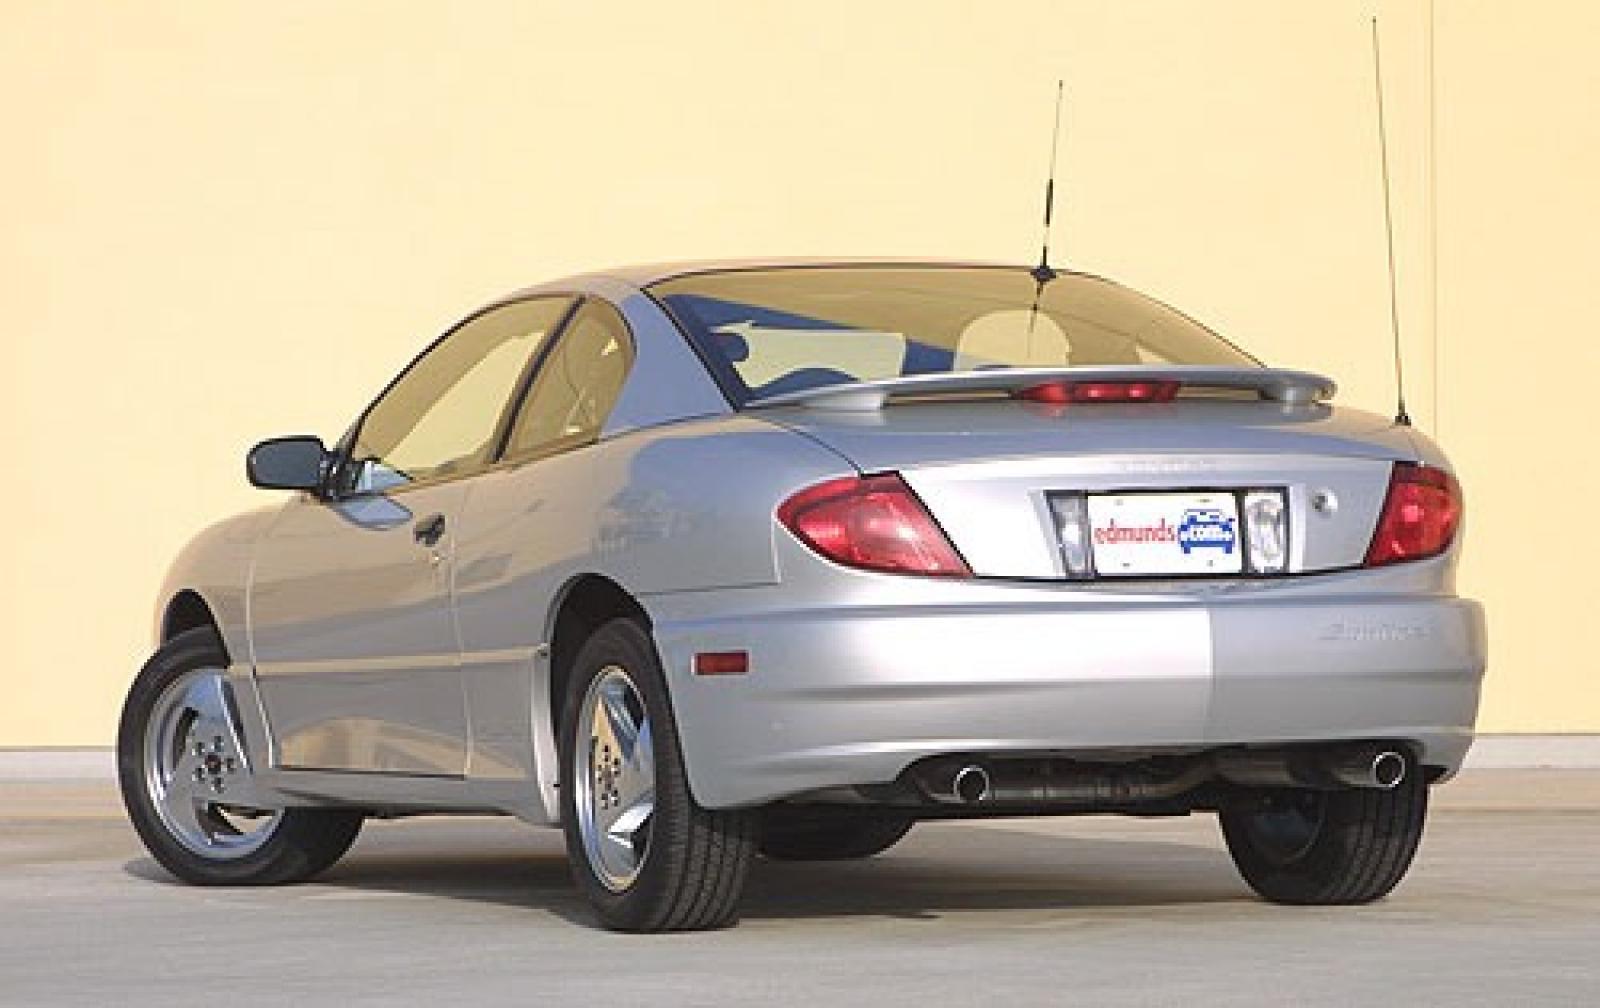 800 1024 1280 1600 origin 2005 Pontiac Sunfire ...